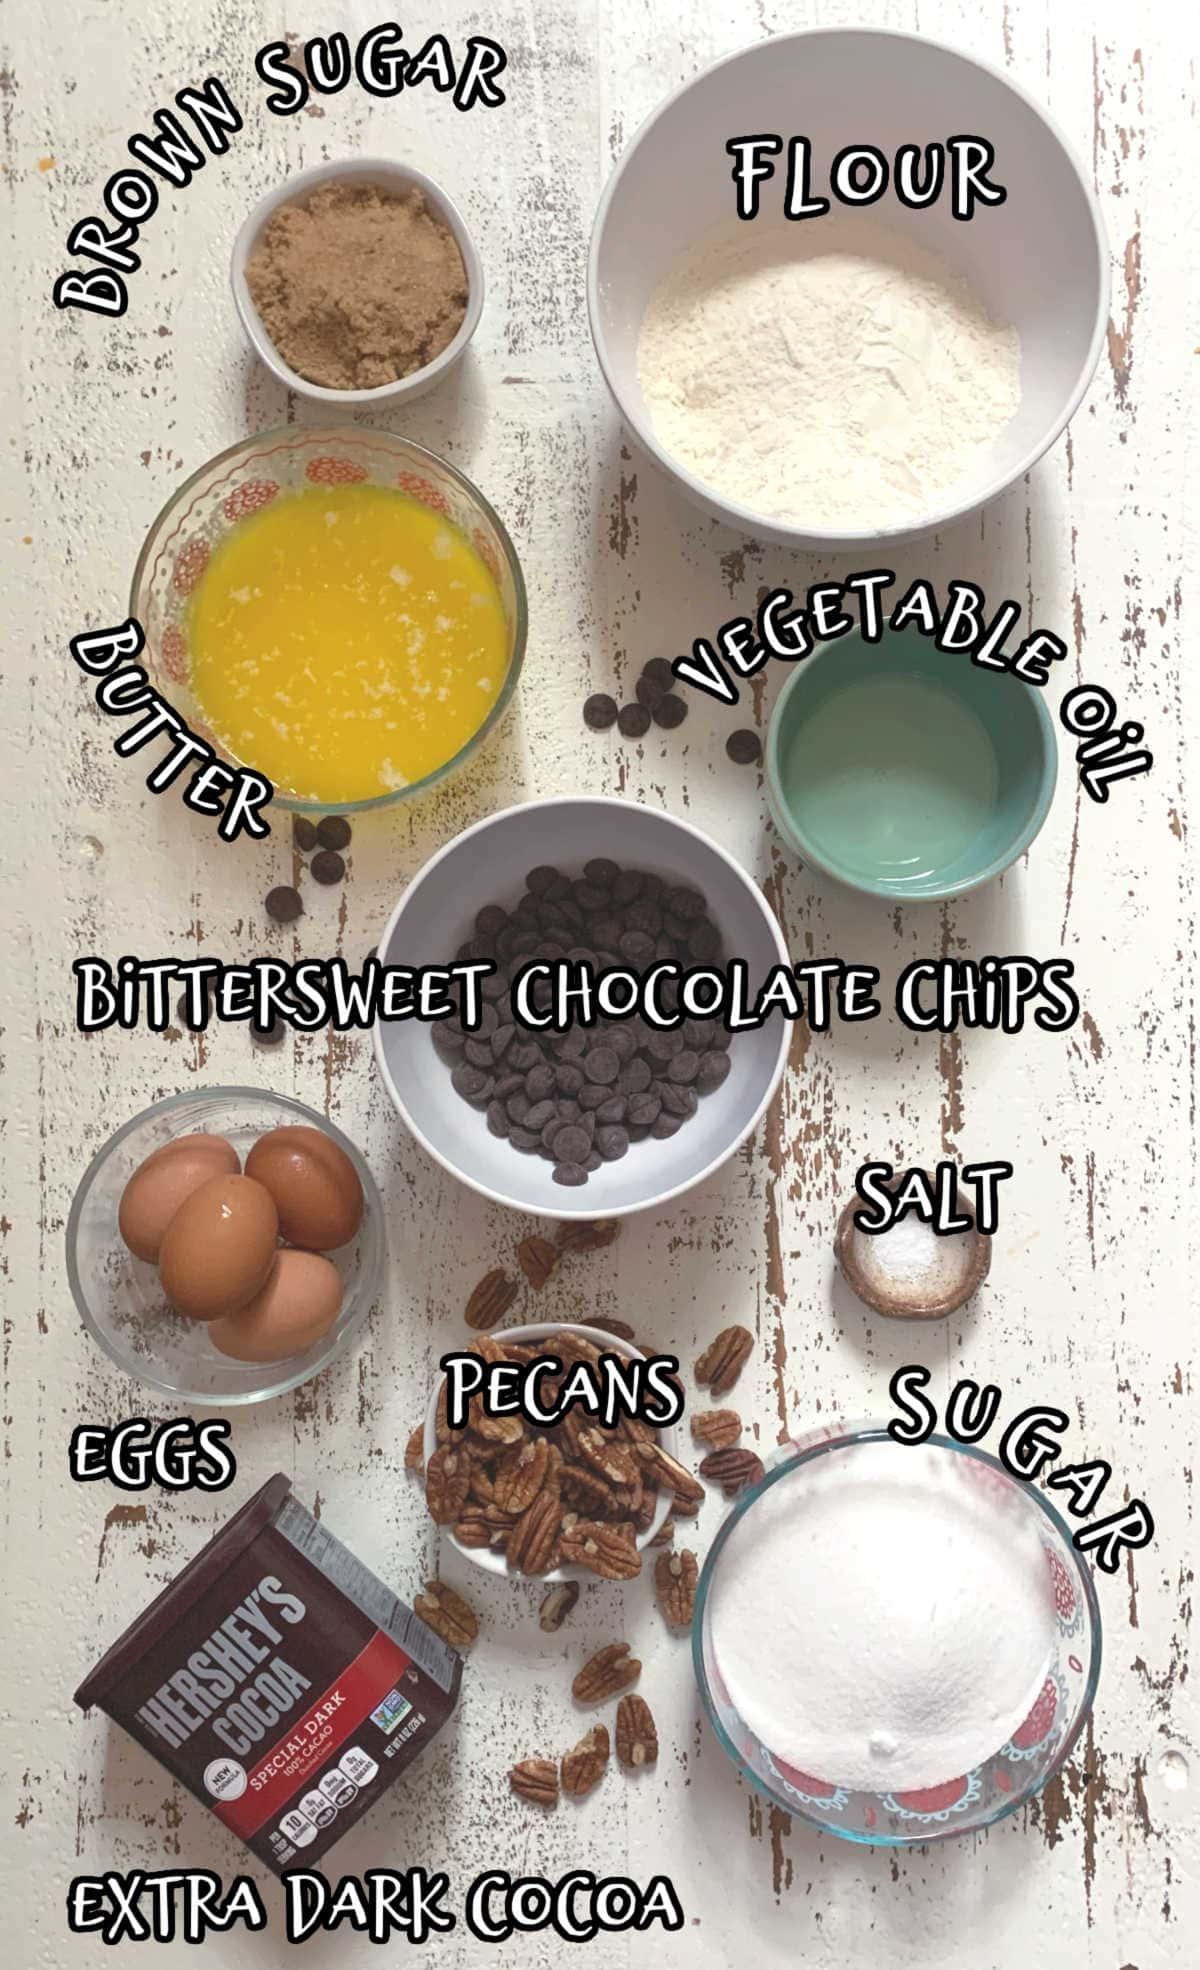 Labeled ingredients for dark chocolate brownies.